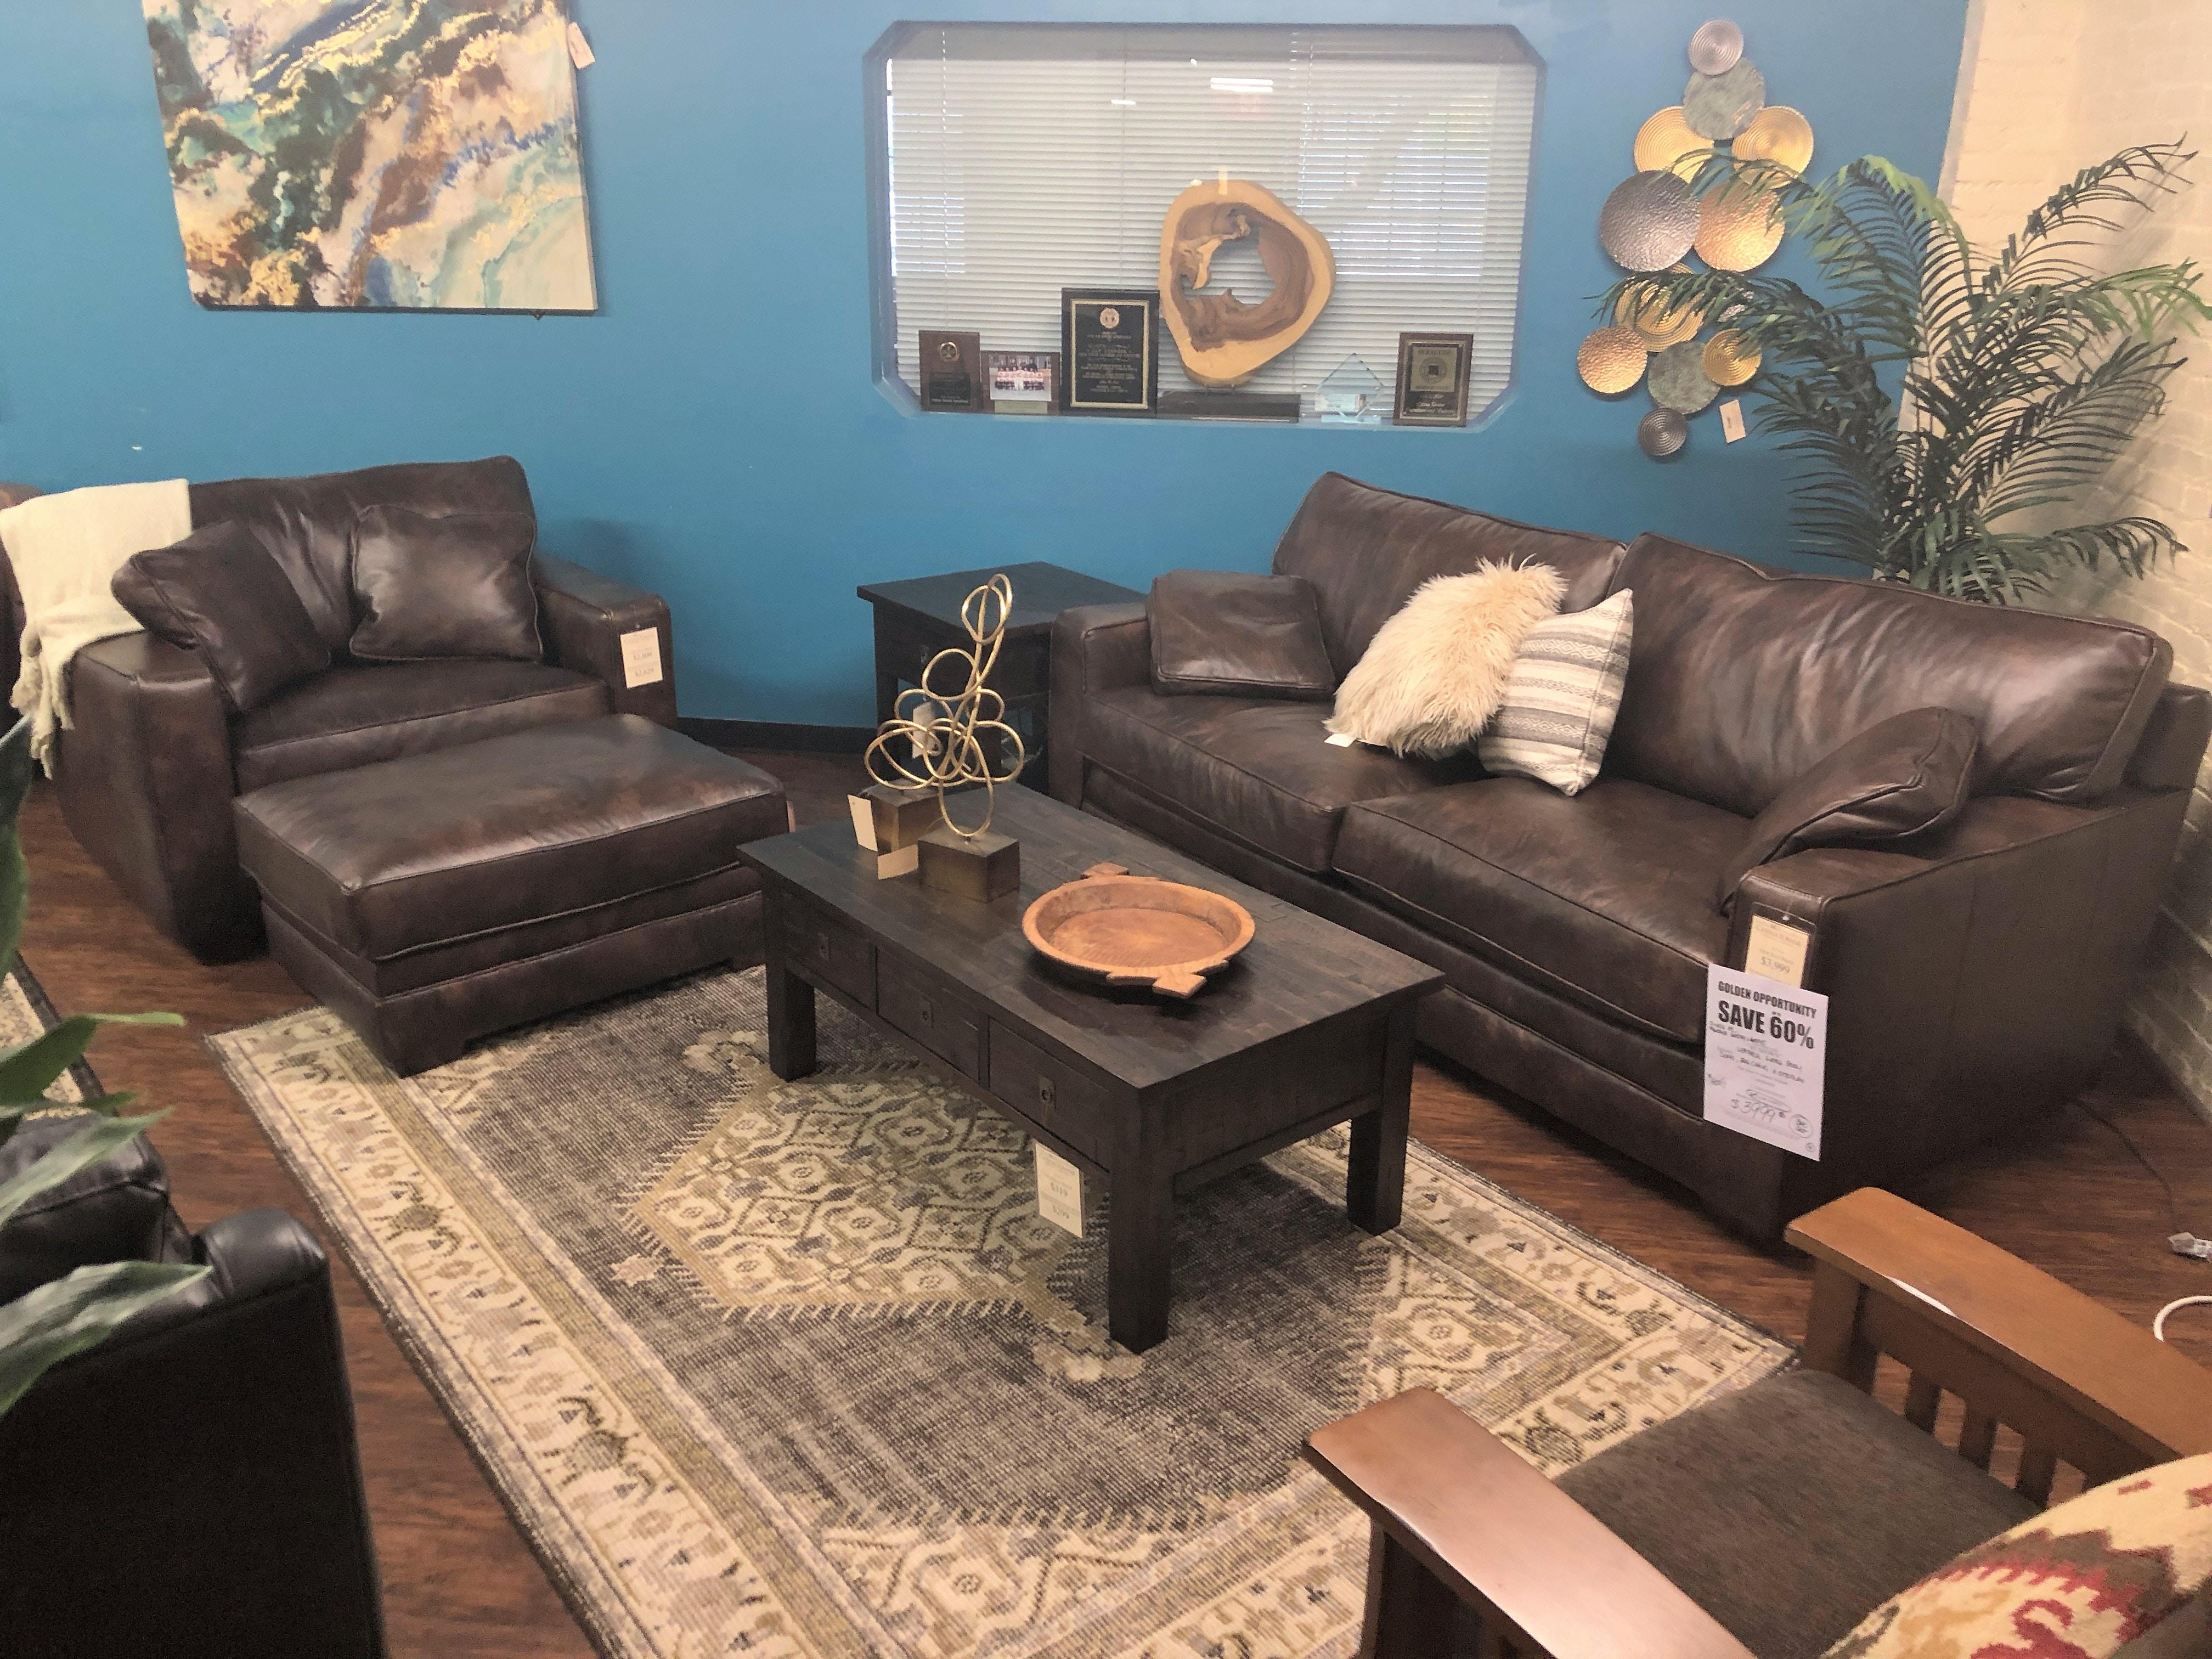 Clearance Genuine Leather Sofa, Big Chair And Ottoman 60543, 60544, 60545